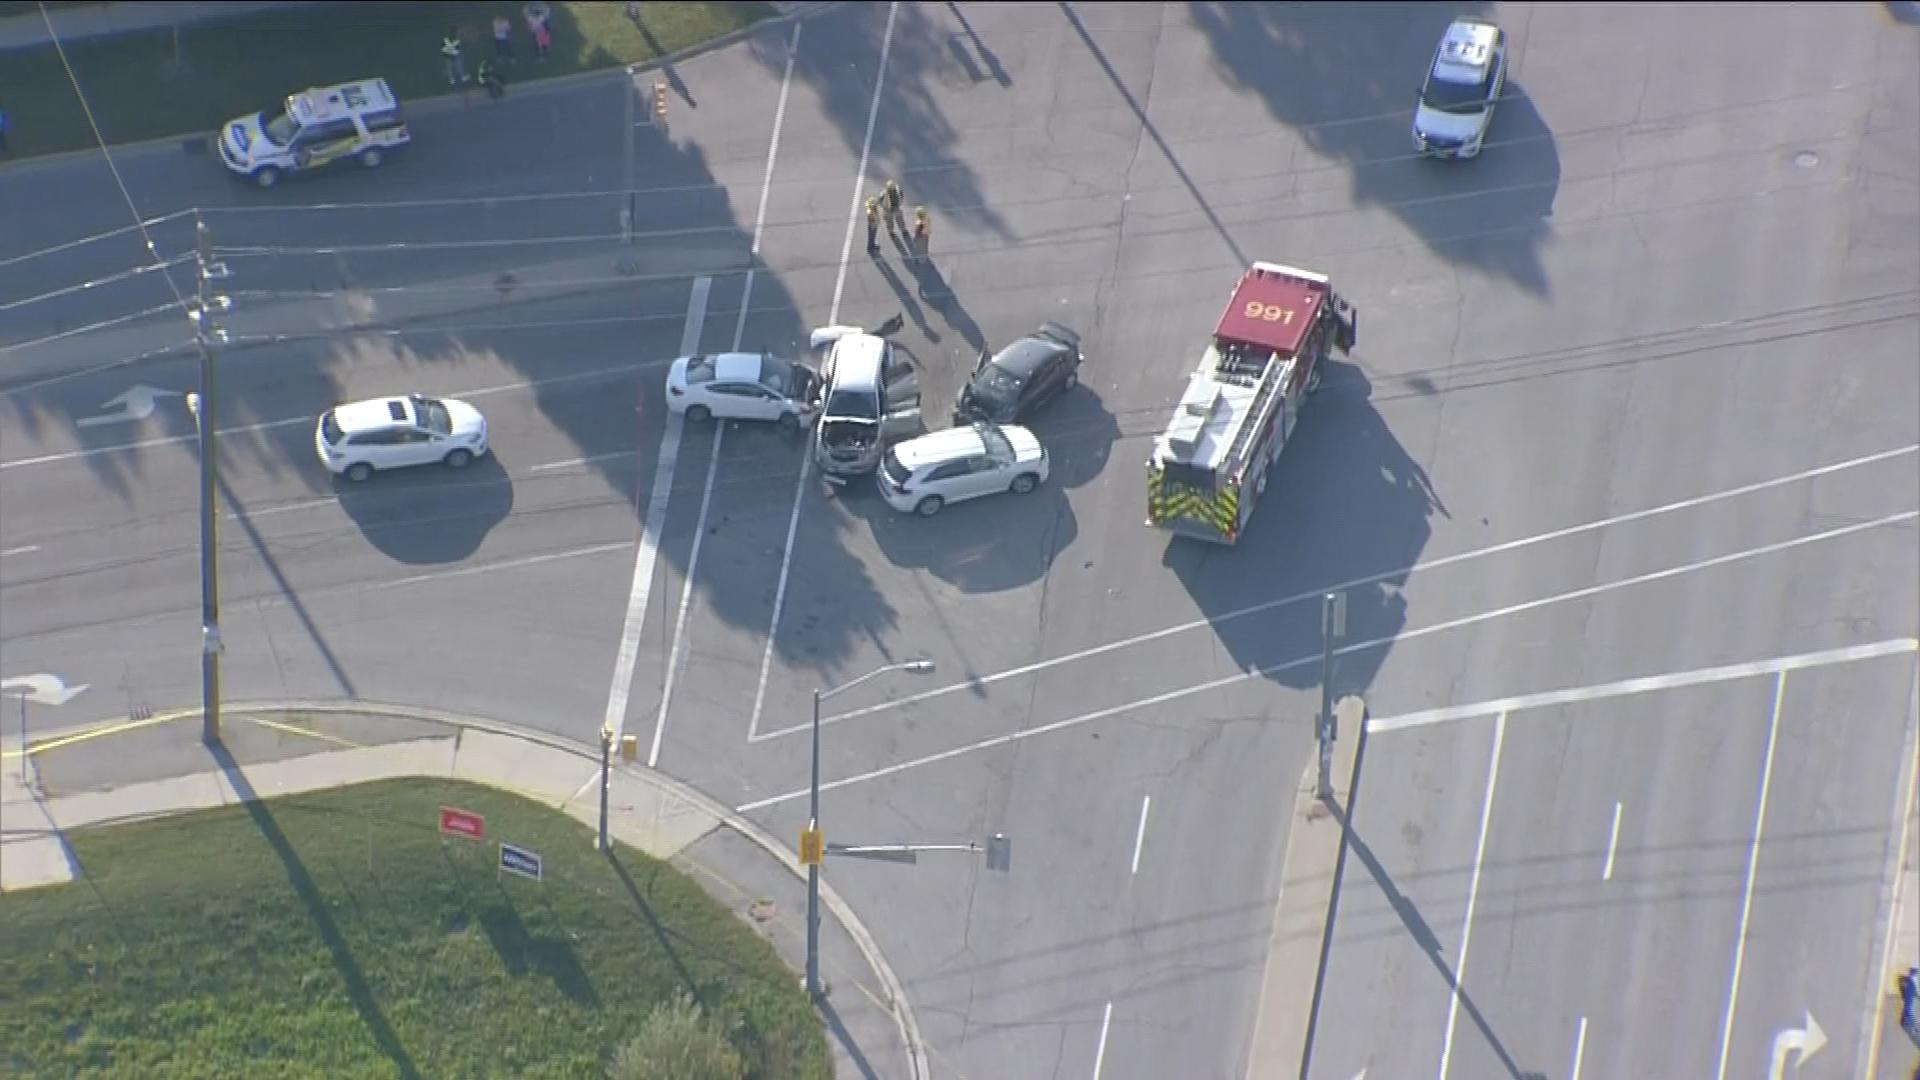 2 seriously injured in multi-vehicle crash in Markham